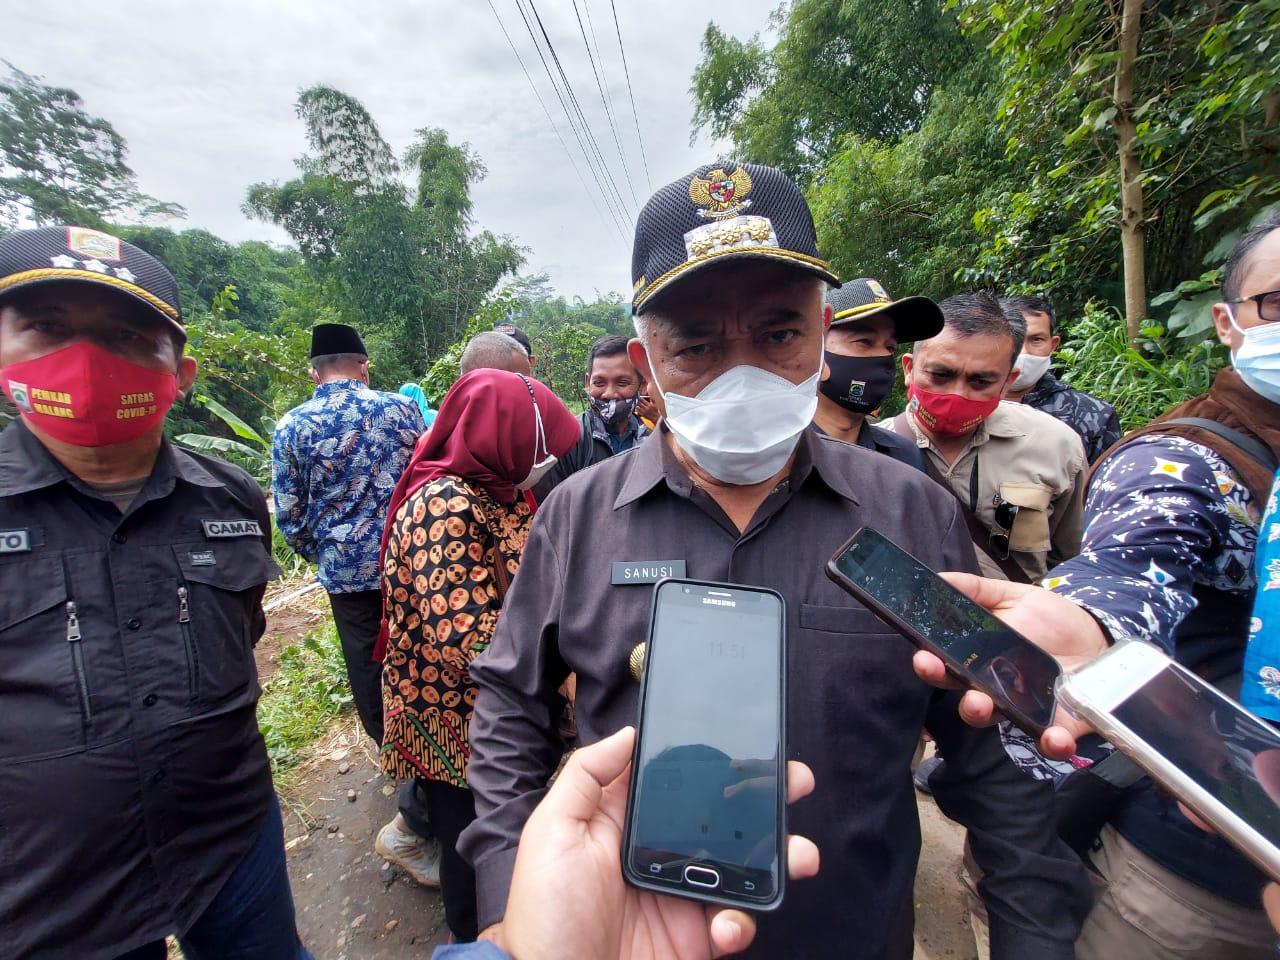 Bupati Malang, Sanusi tanggapi terkait PSBB dan PPKM yang dilakukan di Malang Raya khususnya di Kabupaten Malang. (Foto: Rap/Tugu Malang/Tugu Jatim)